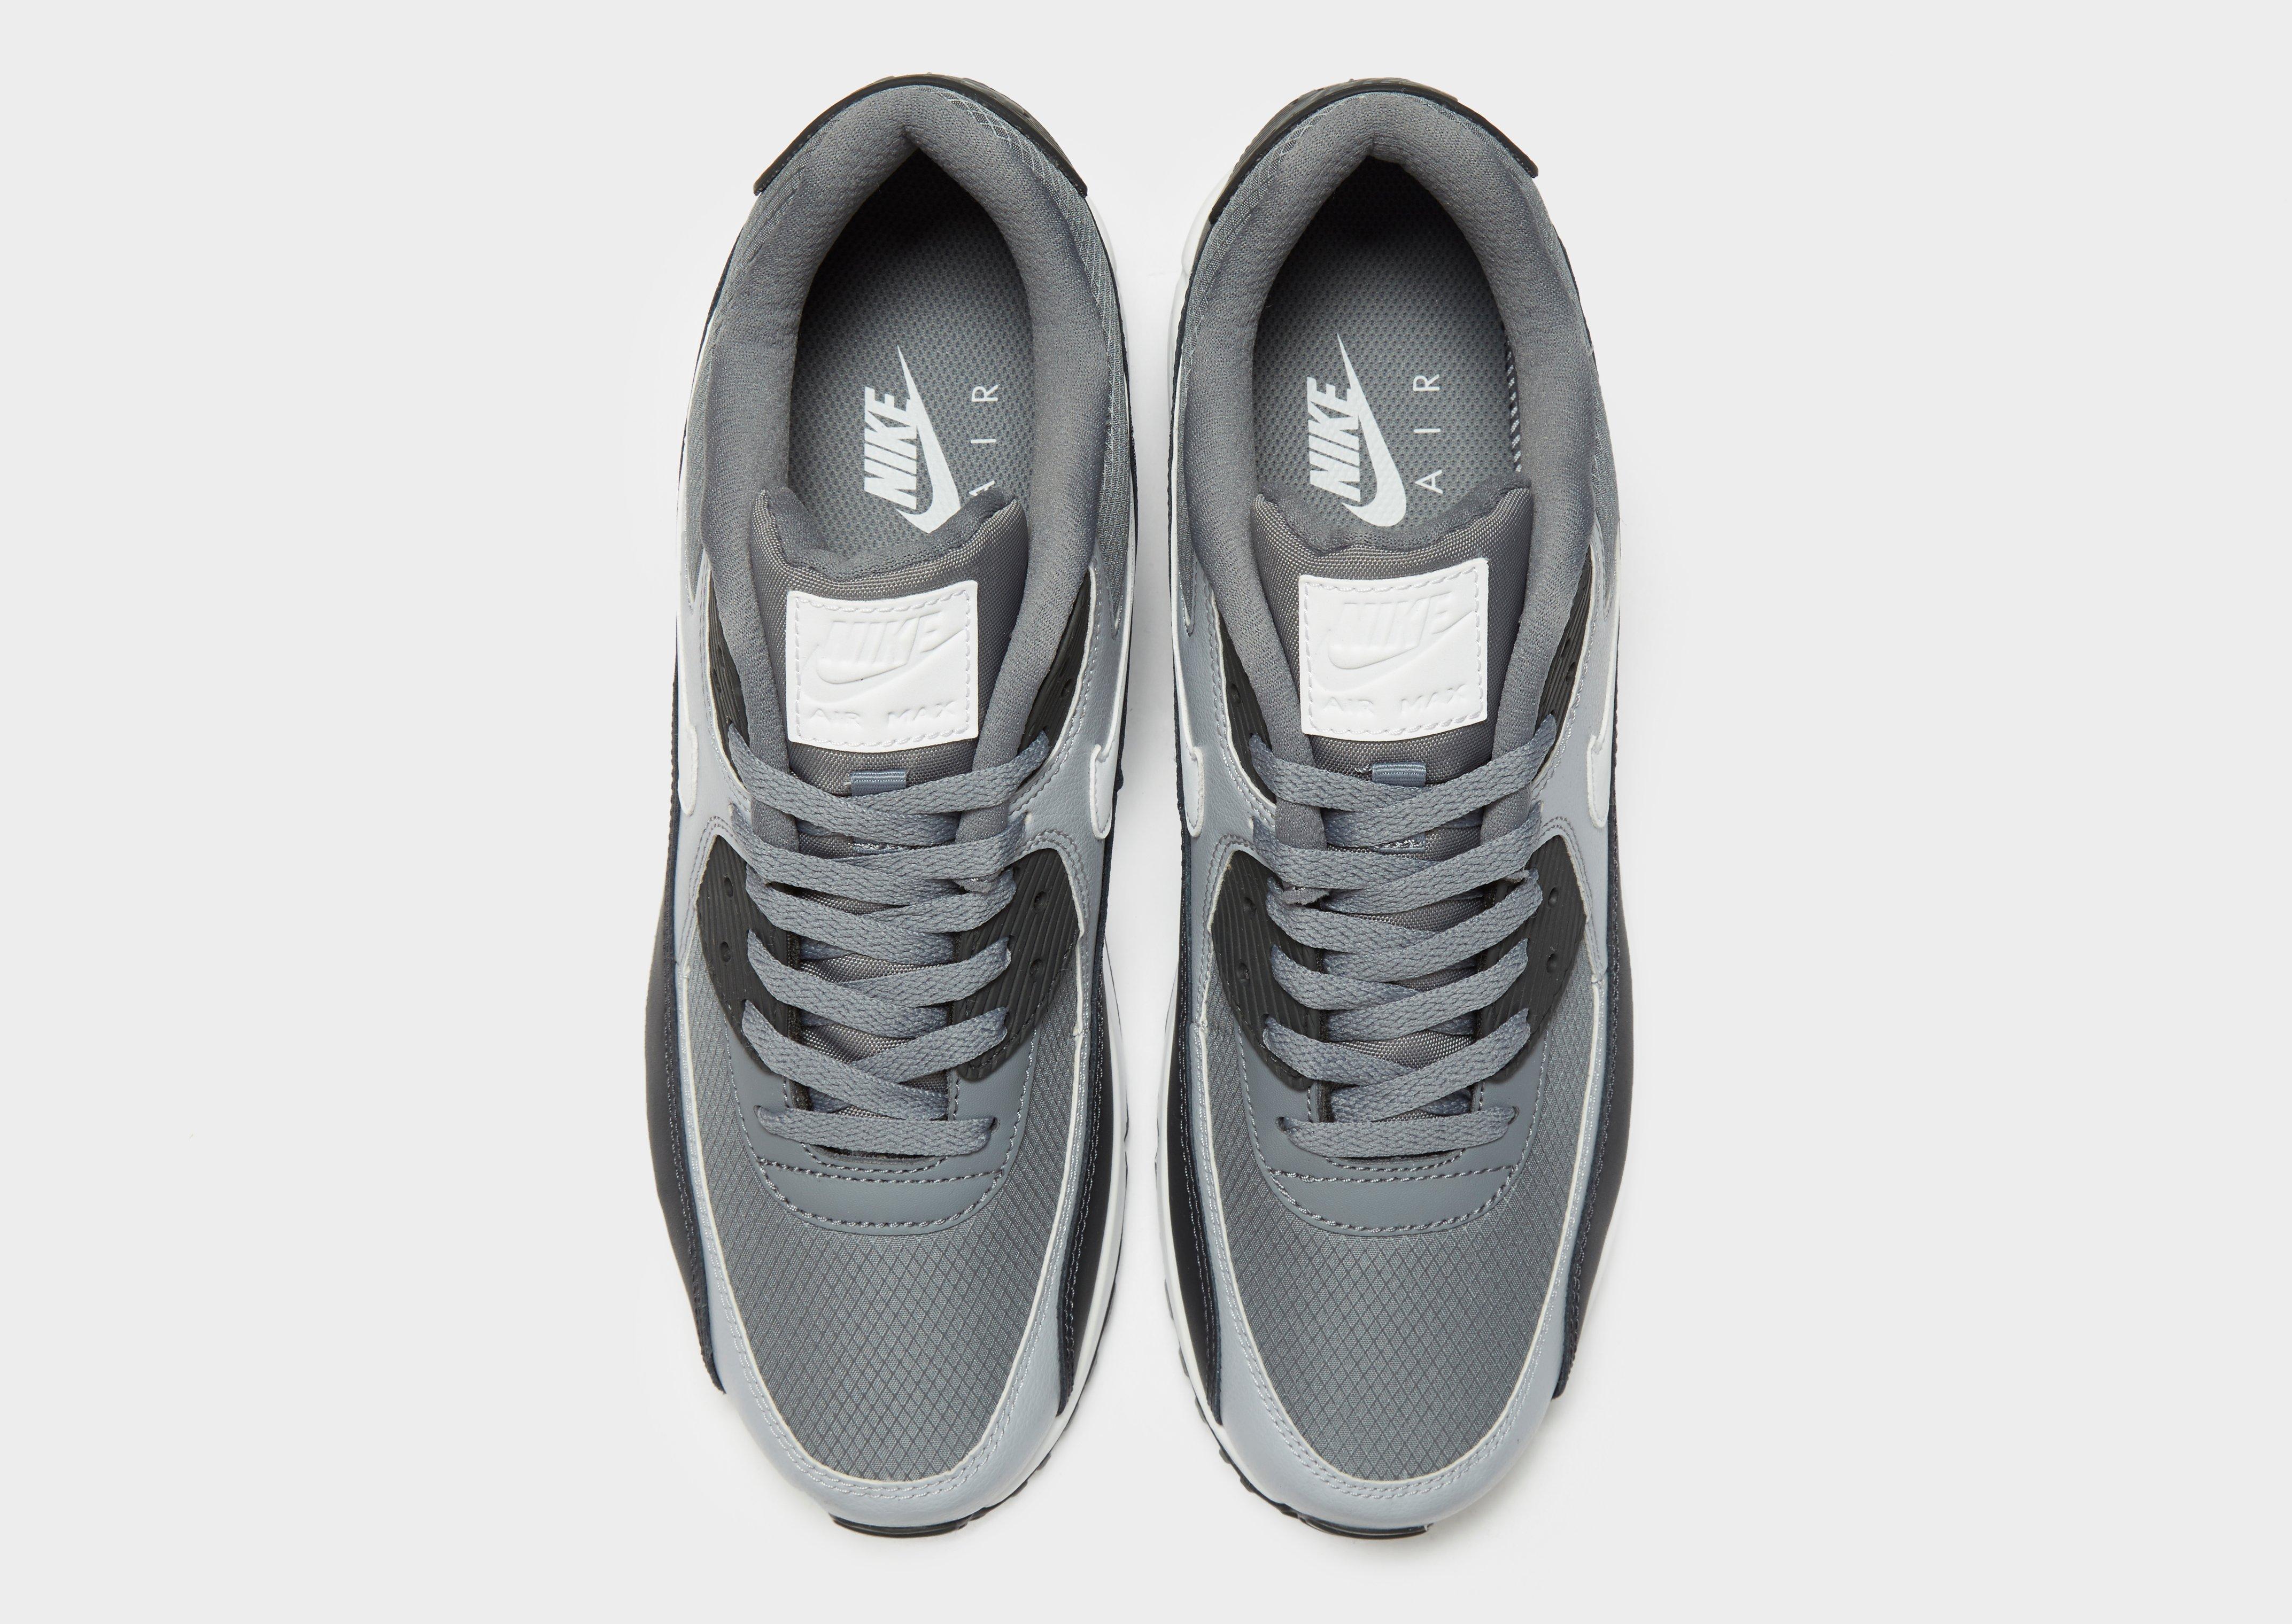 e98a9bc5ca59 Nike Fi Queen Mens Walking Shoes